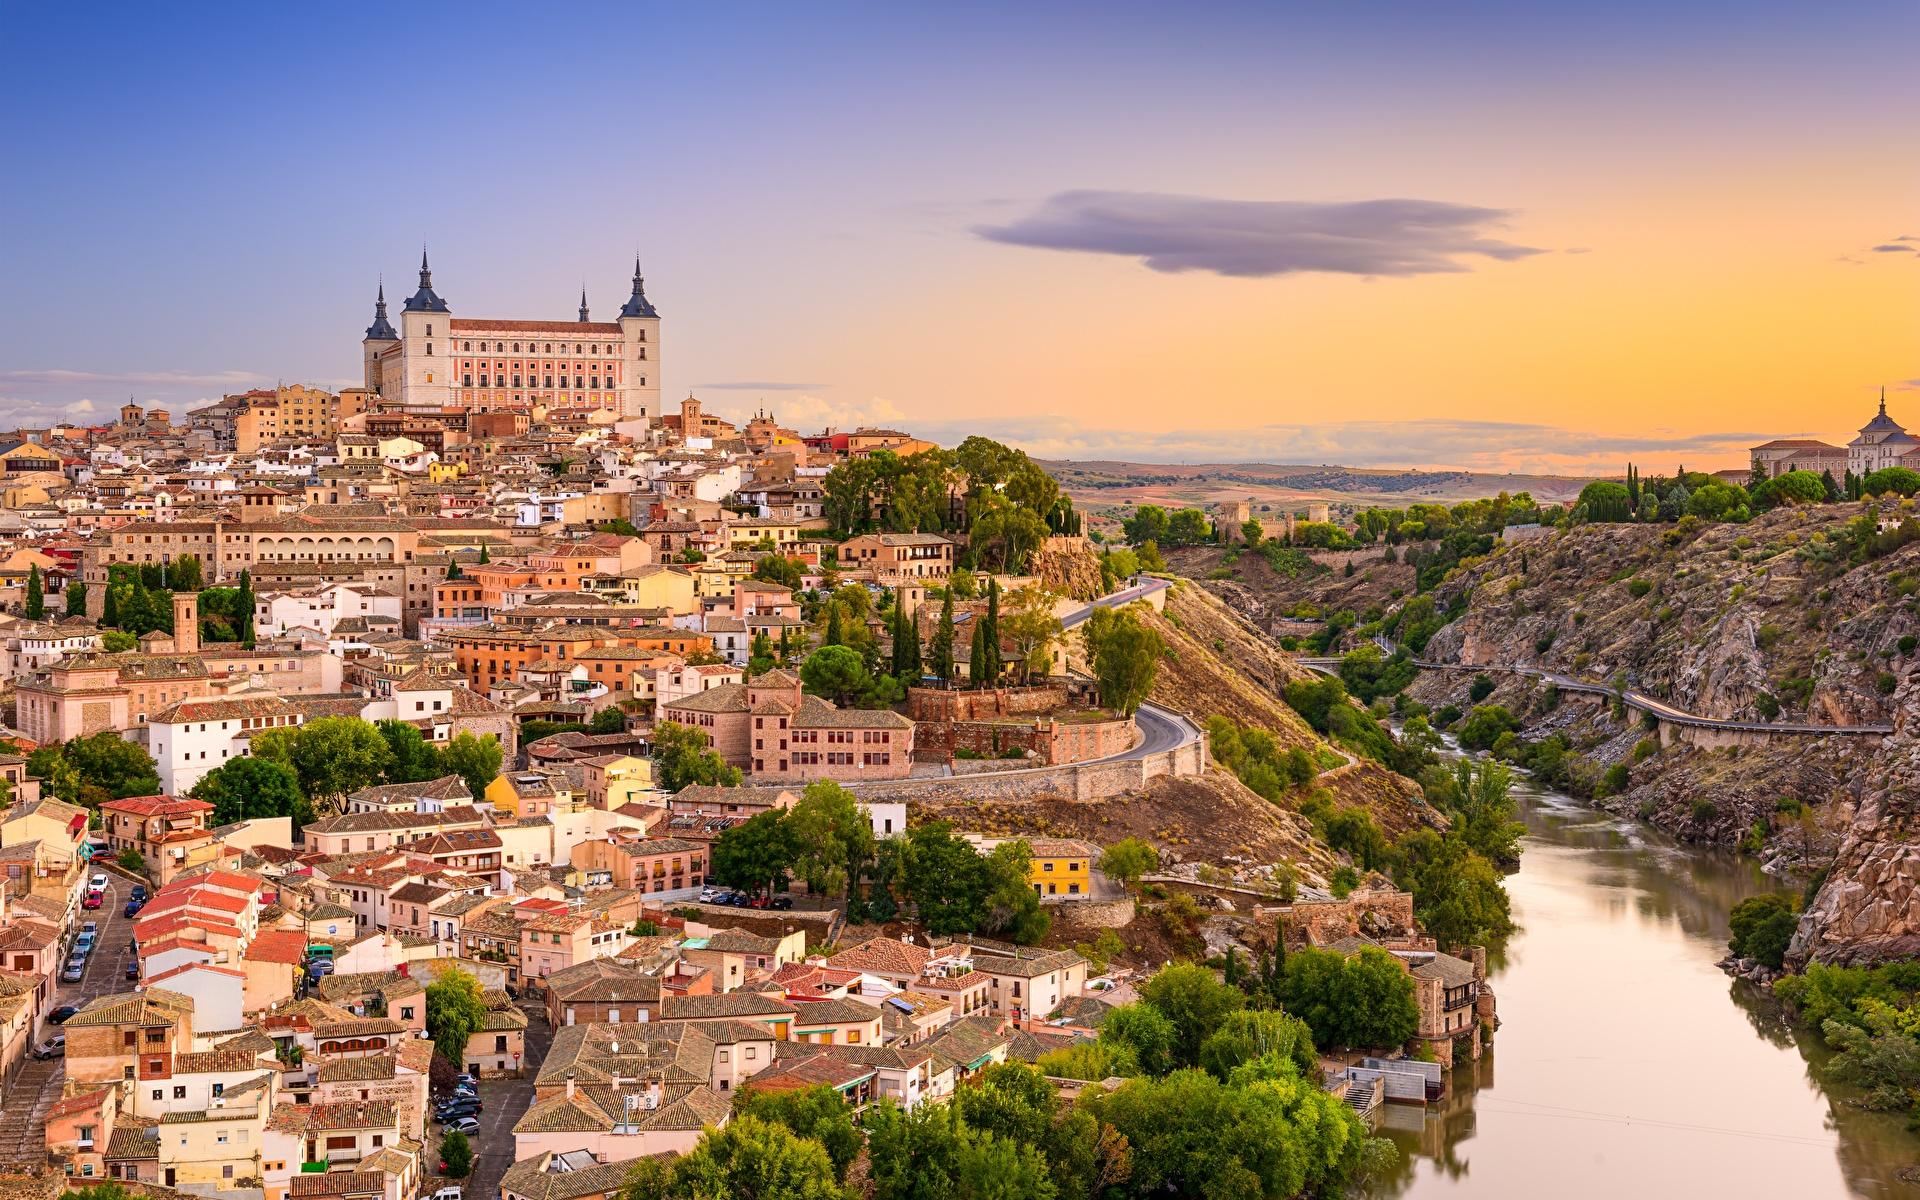 Wallpaper Toledo Spain Castile-La Mancha, Tagus river castle sunrise and sunset Rivers Cities 1920x1200 Castles Sunrises and sunsets